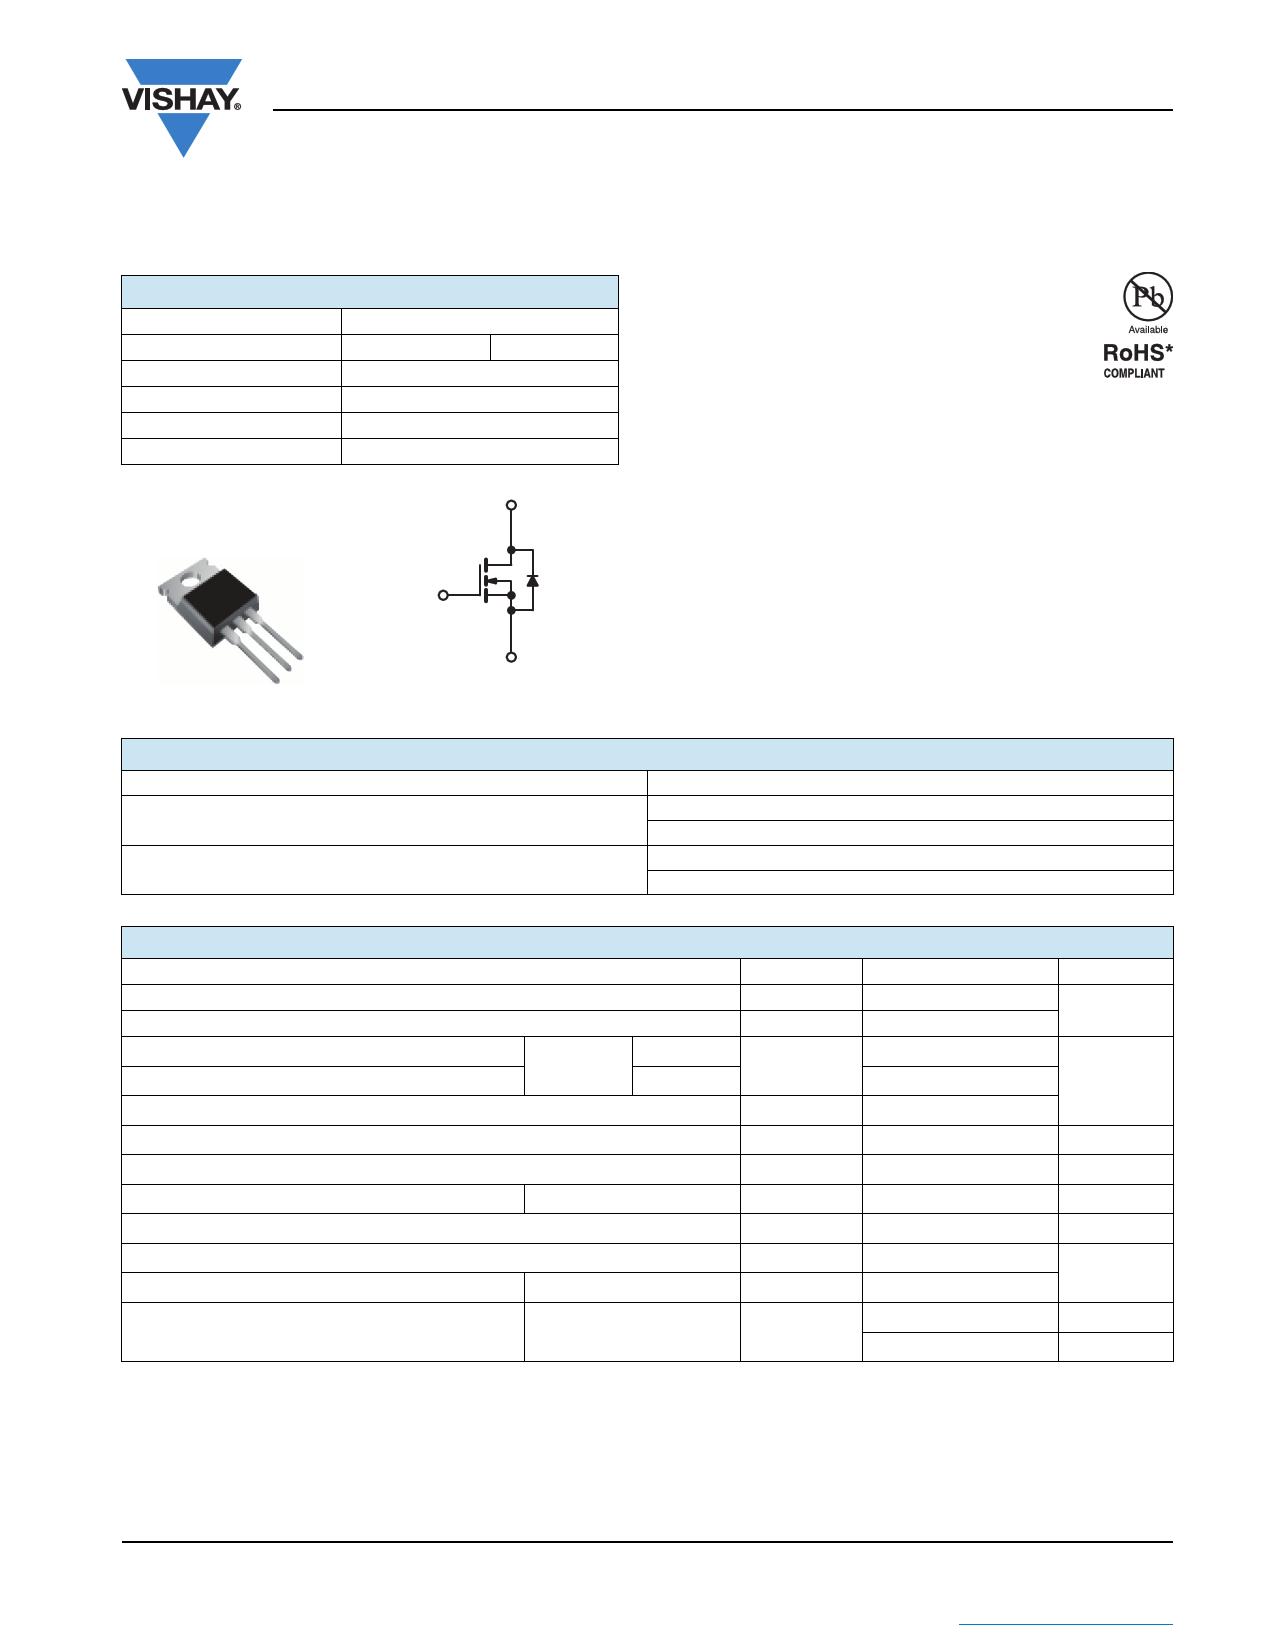 SIHFZ40 datasheet